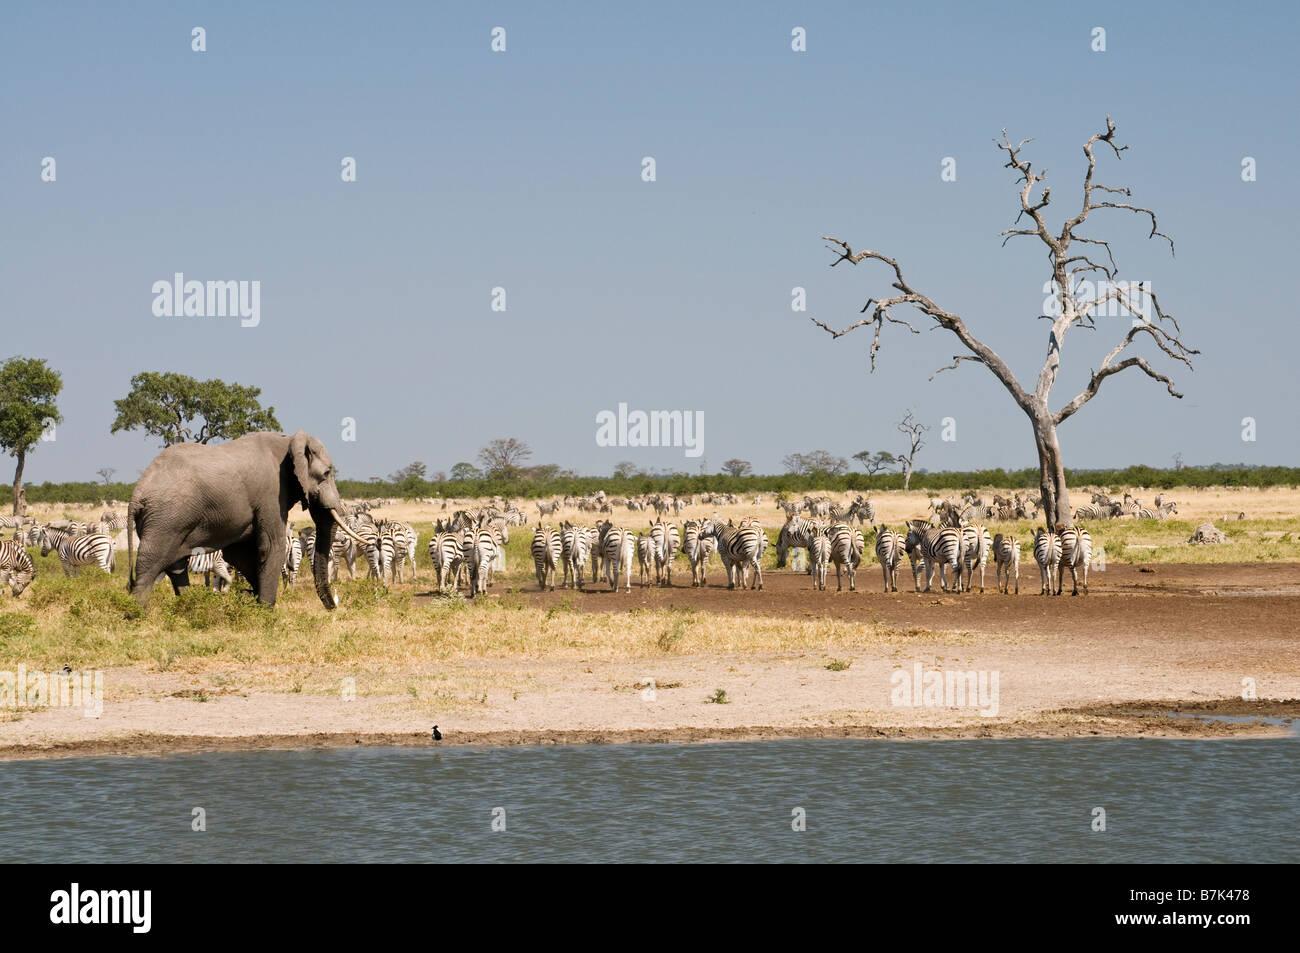 Elephant Zebra at the water Savuti - Stock Image